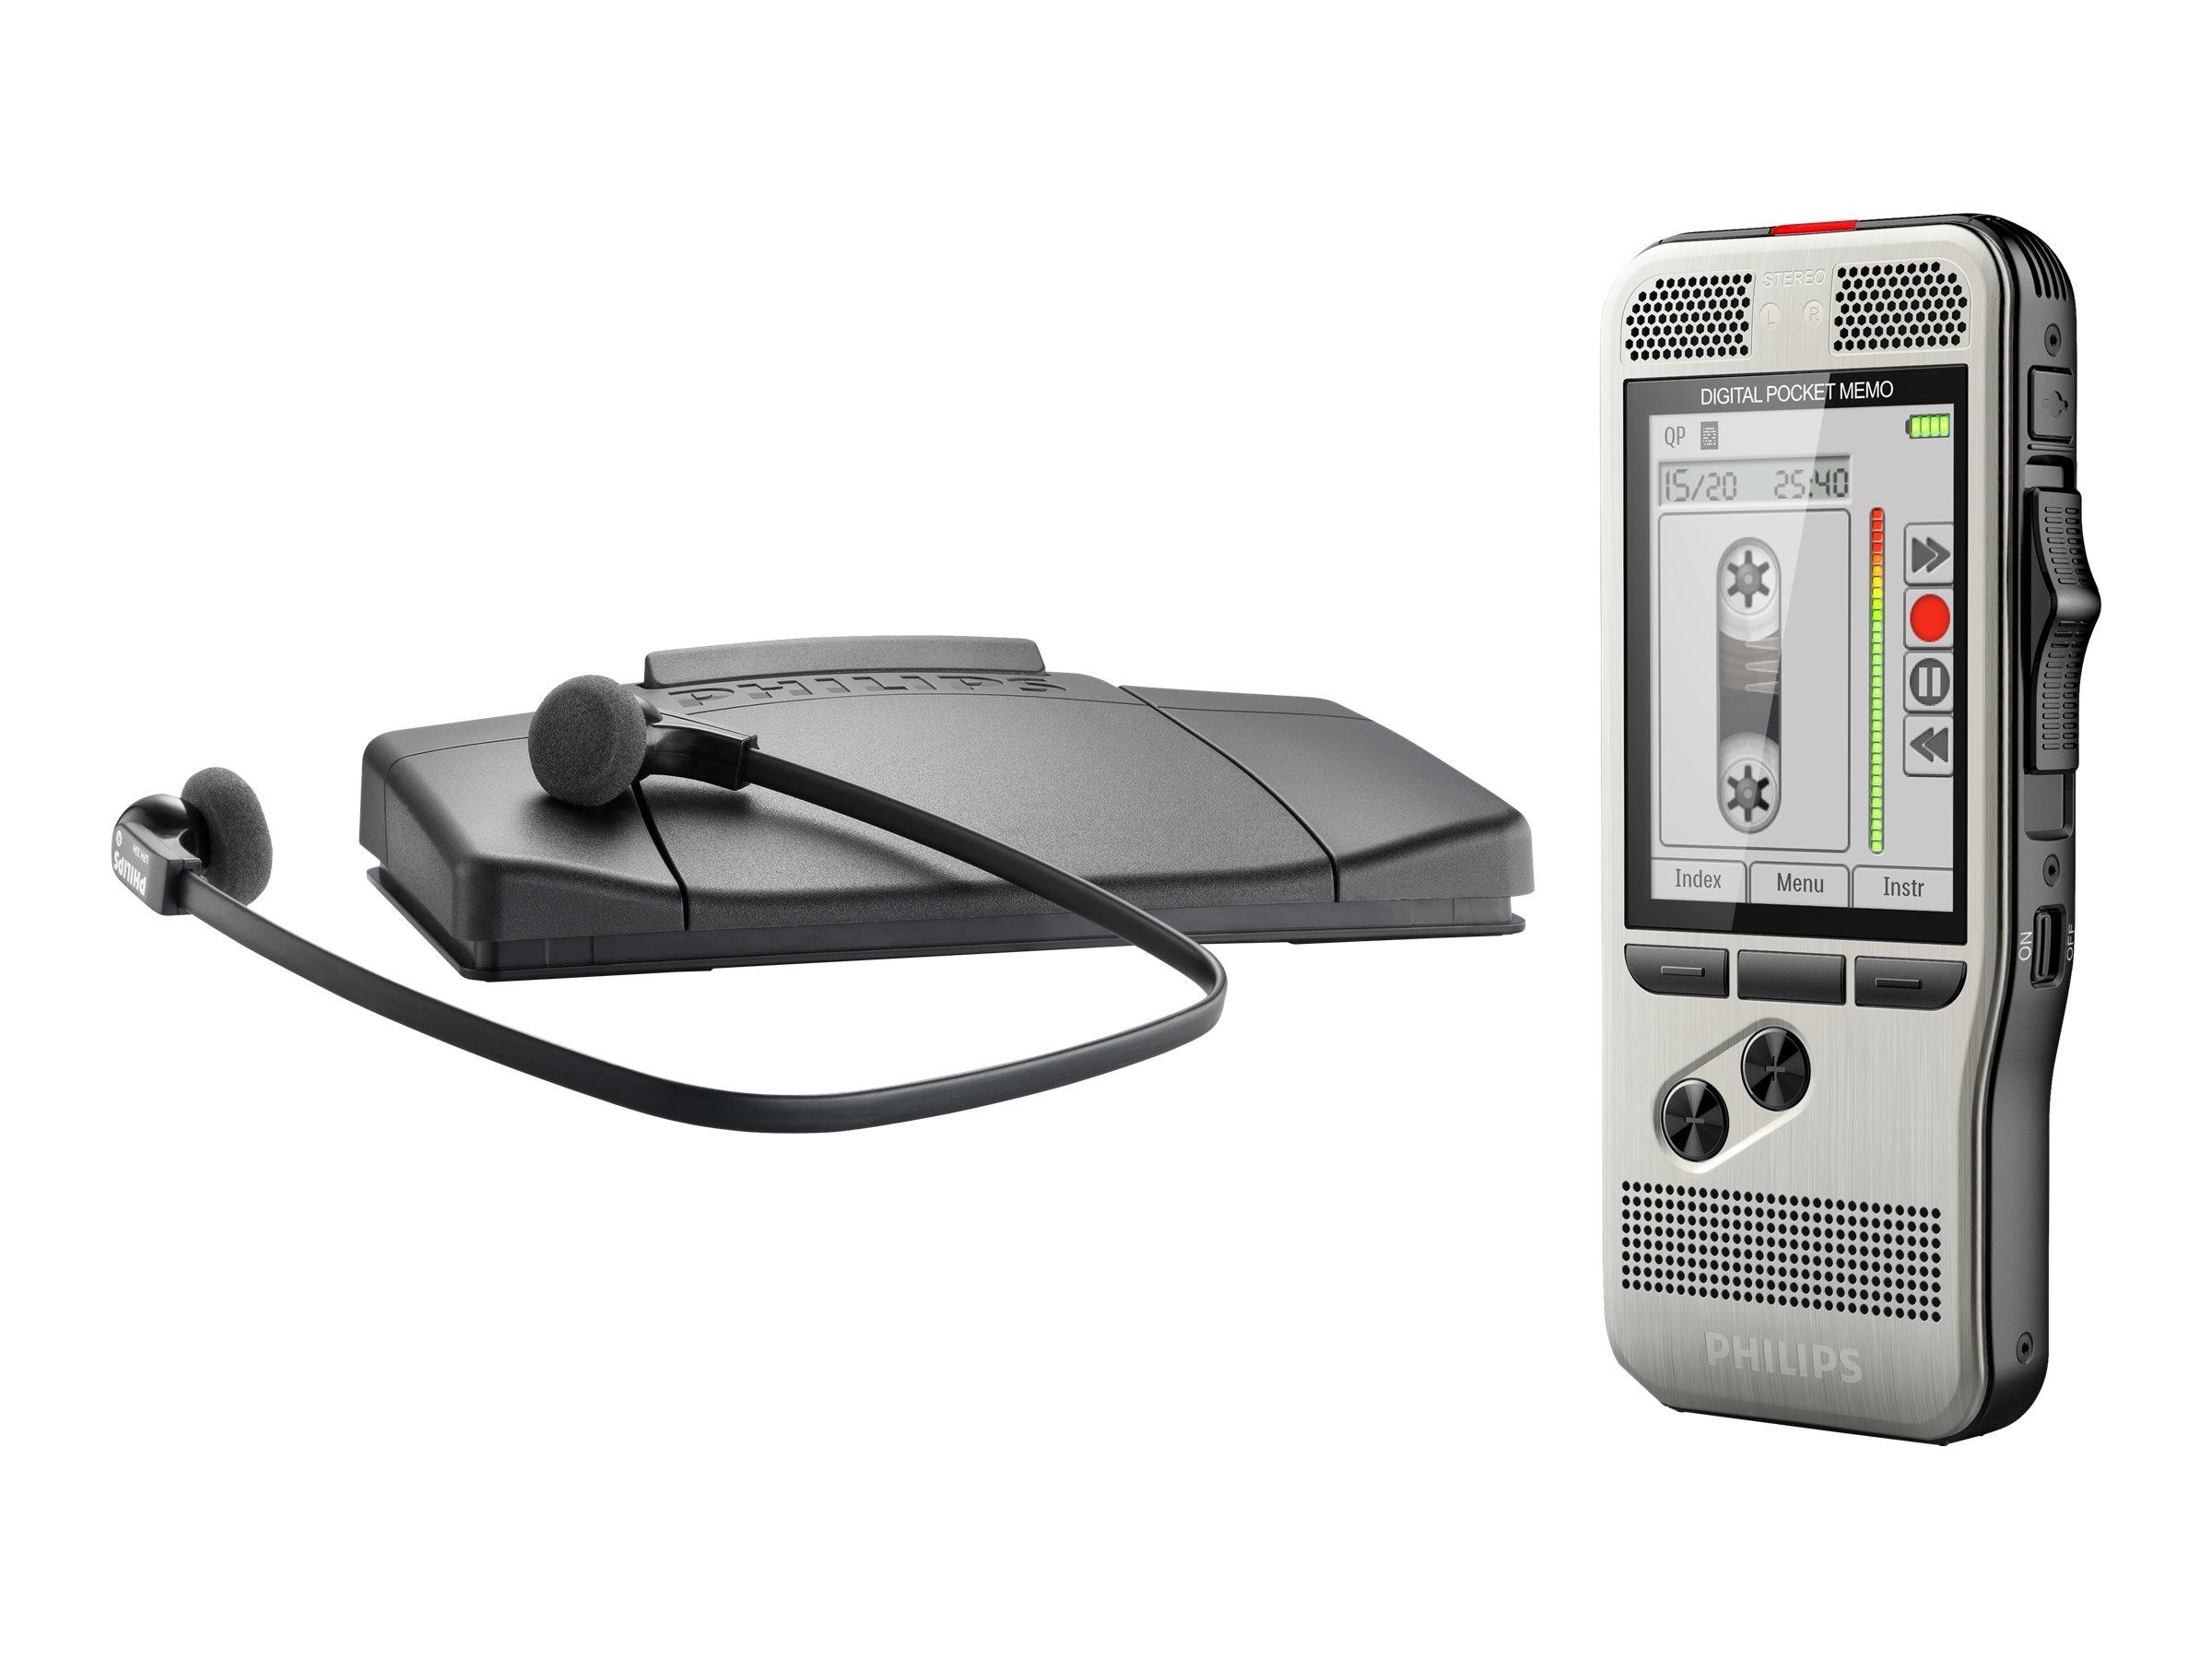 Philips Pocket Memo DPM7700 - Voicerecorder - 200 mW